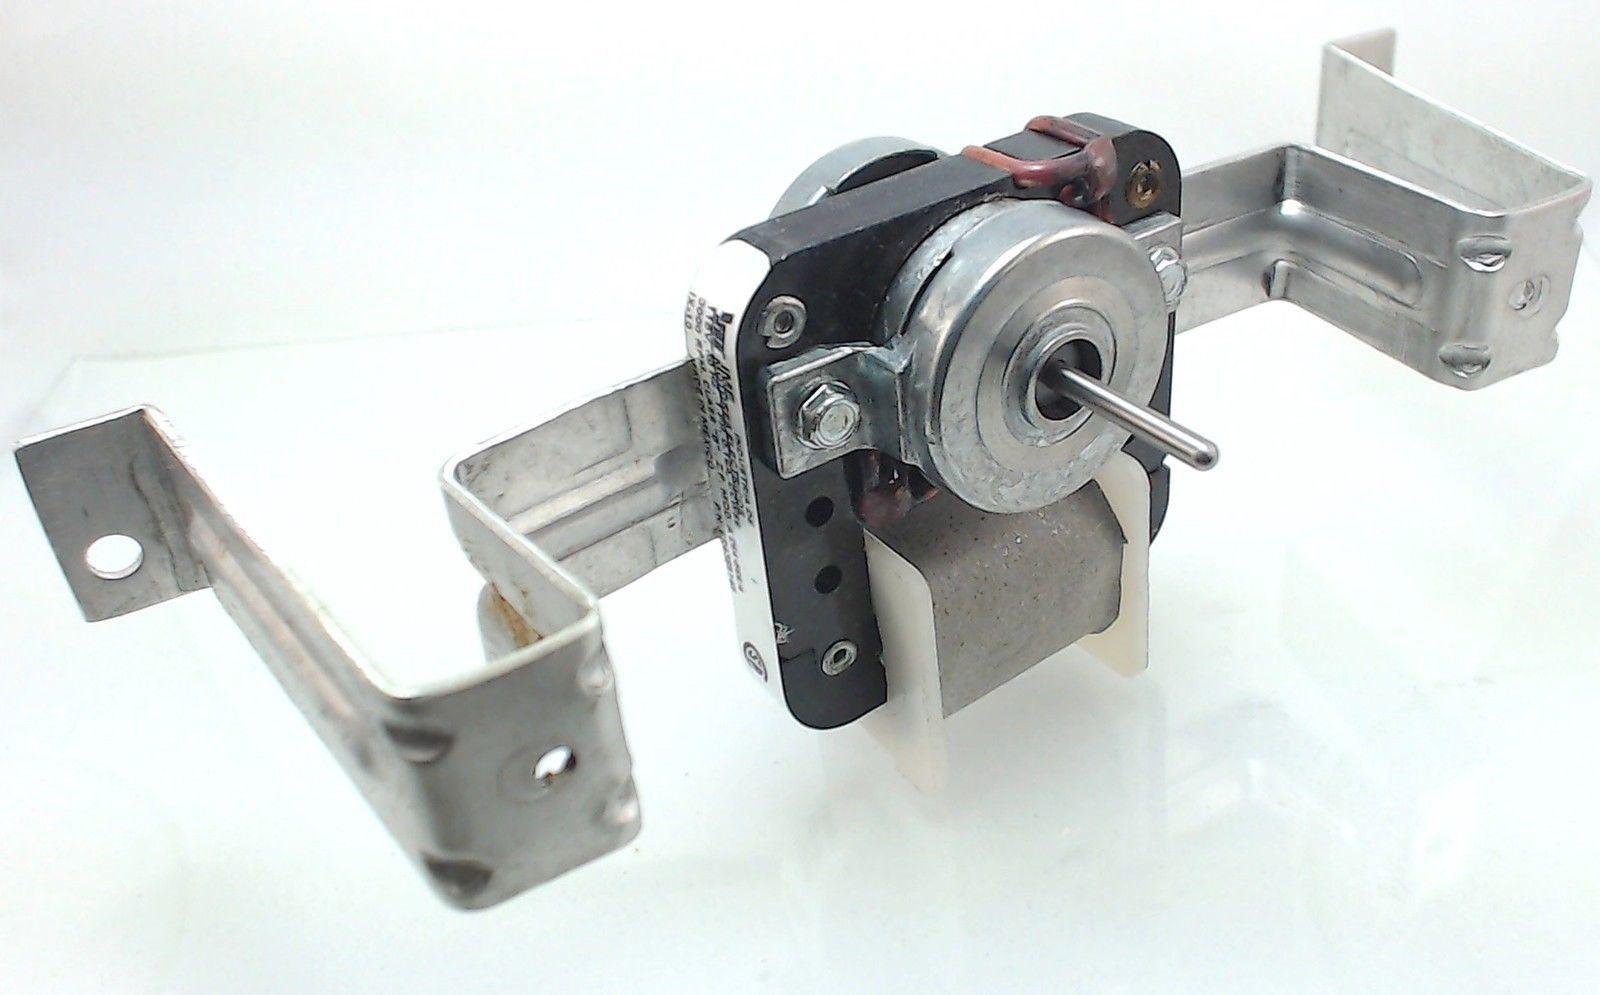 Refrigeration evaporator motor for whirlpool sears for How to test refrigerator evaporator fan motor